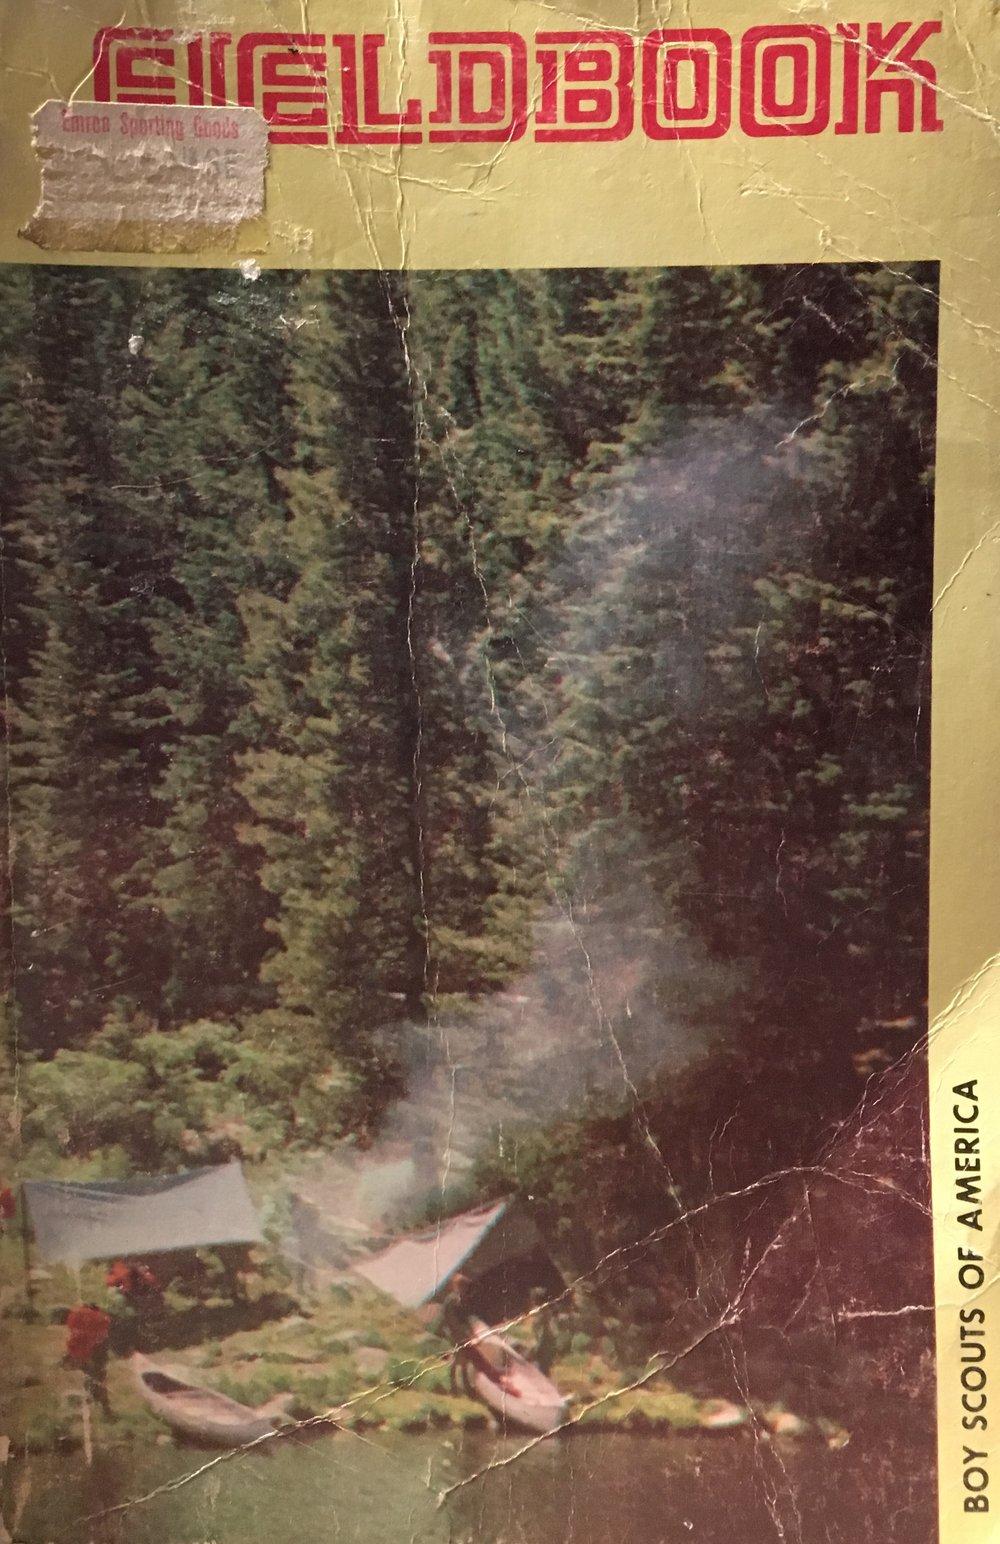 1967 Fieldbook Cover